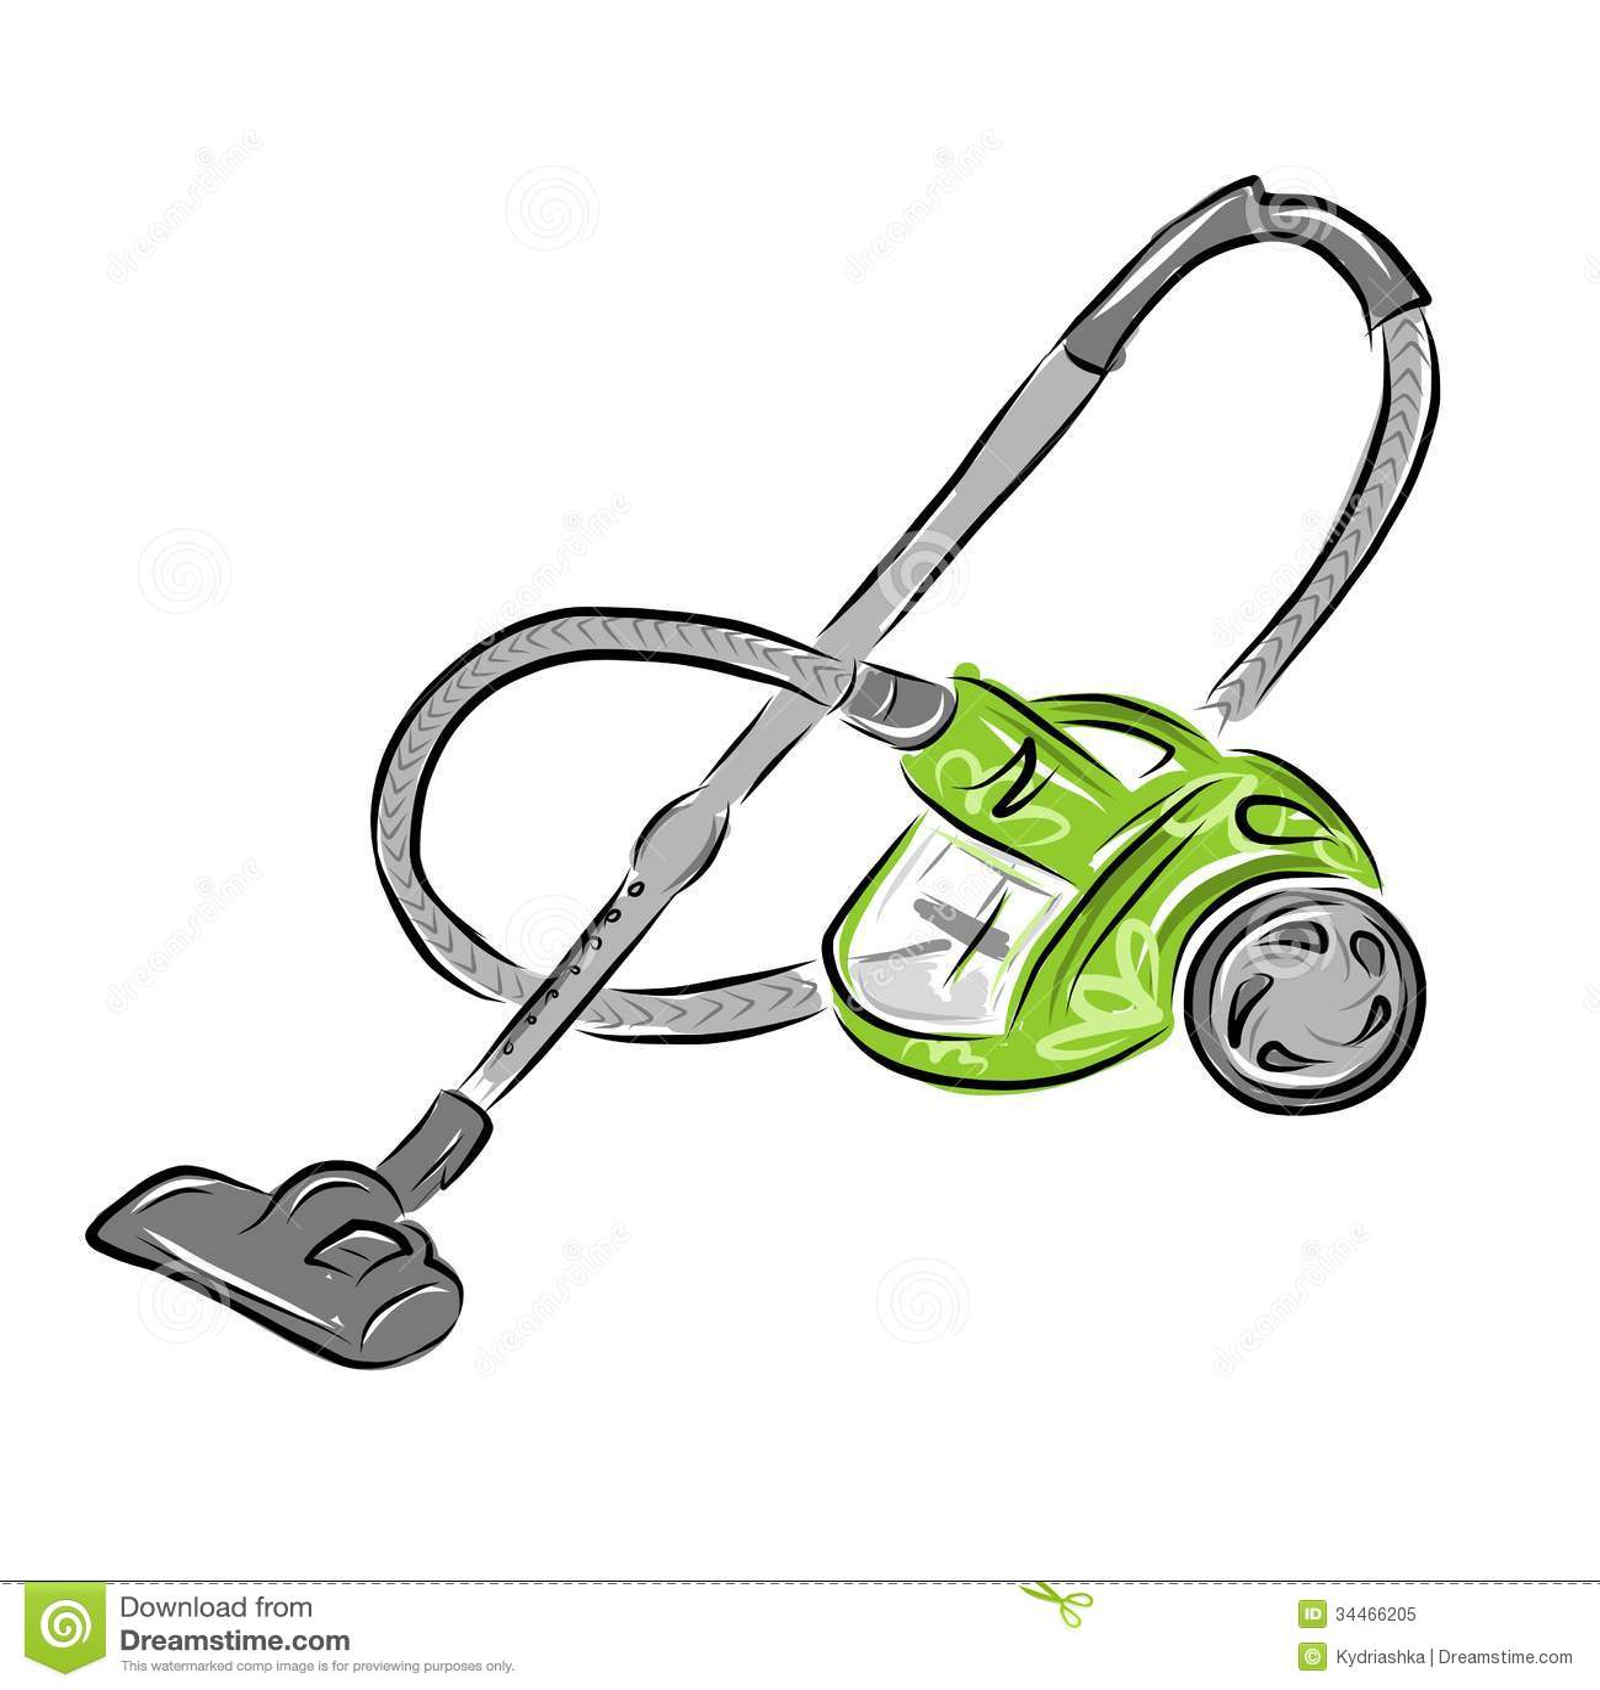 Vector Technologies Ltd - Industrial Vacuum Cleaners